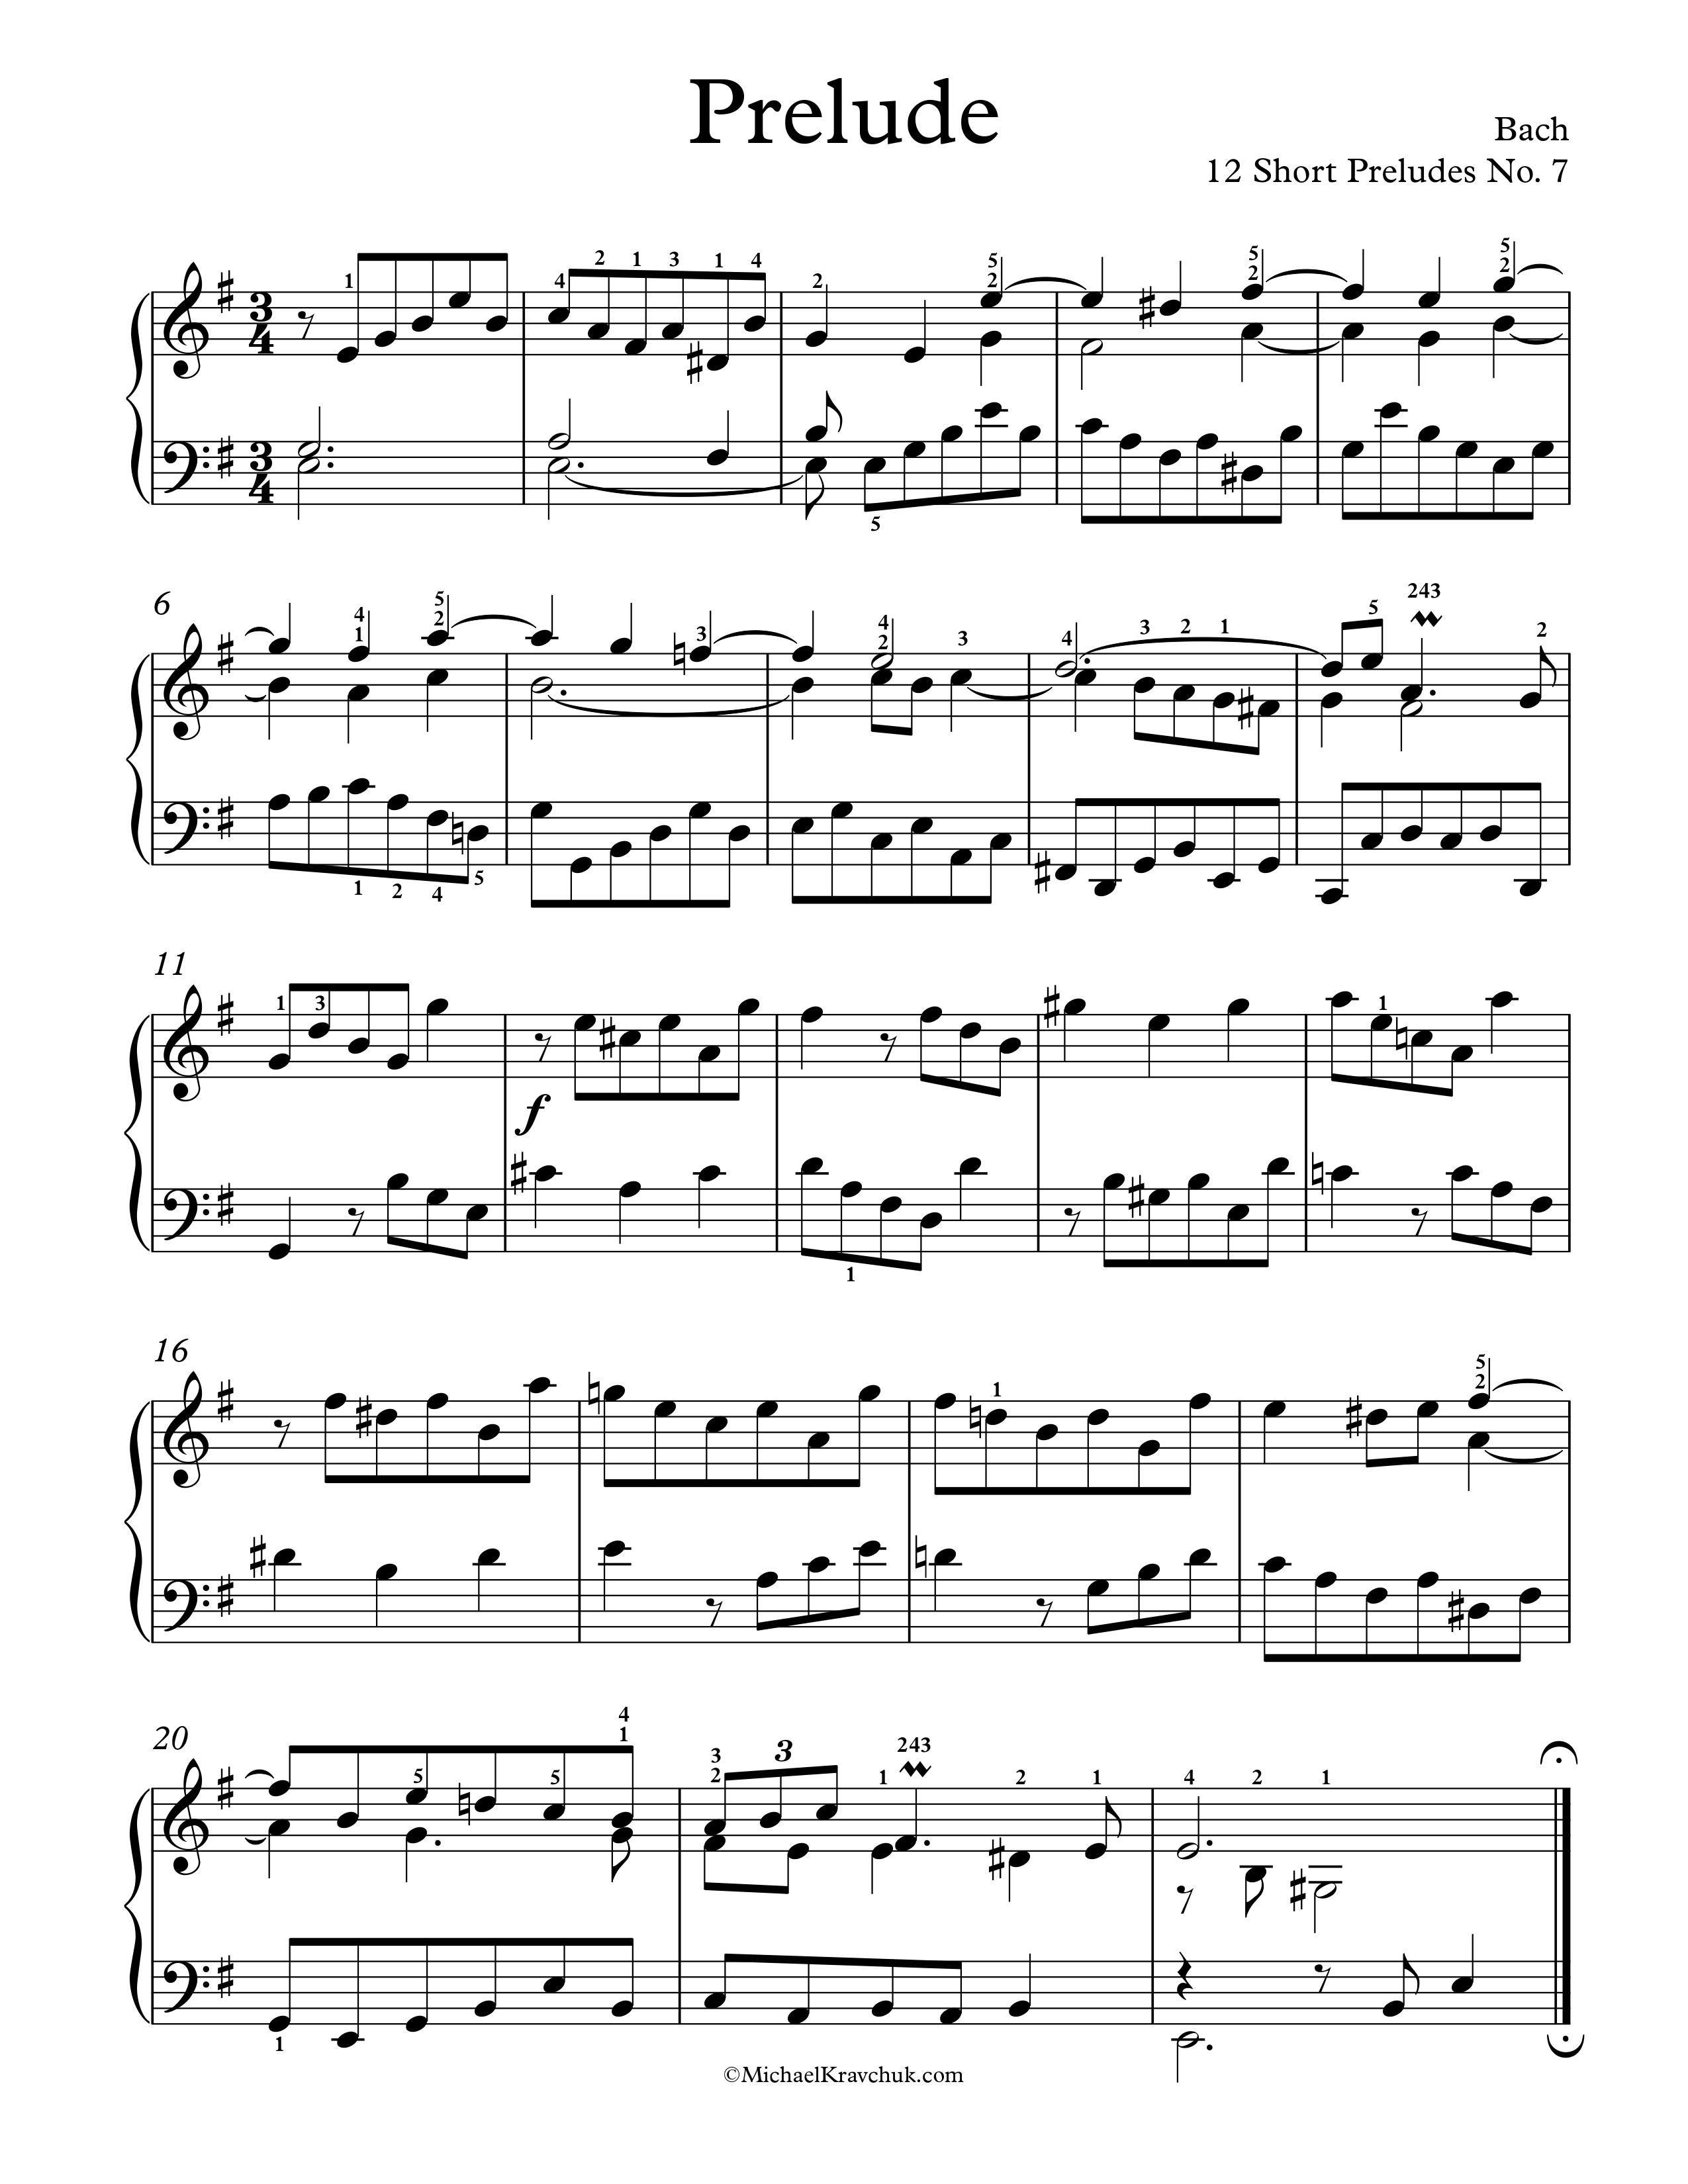 Free Piano Sheet Music 12 Short Preludes No 7 Bach Enjoy